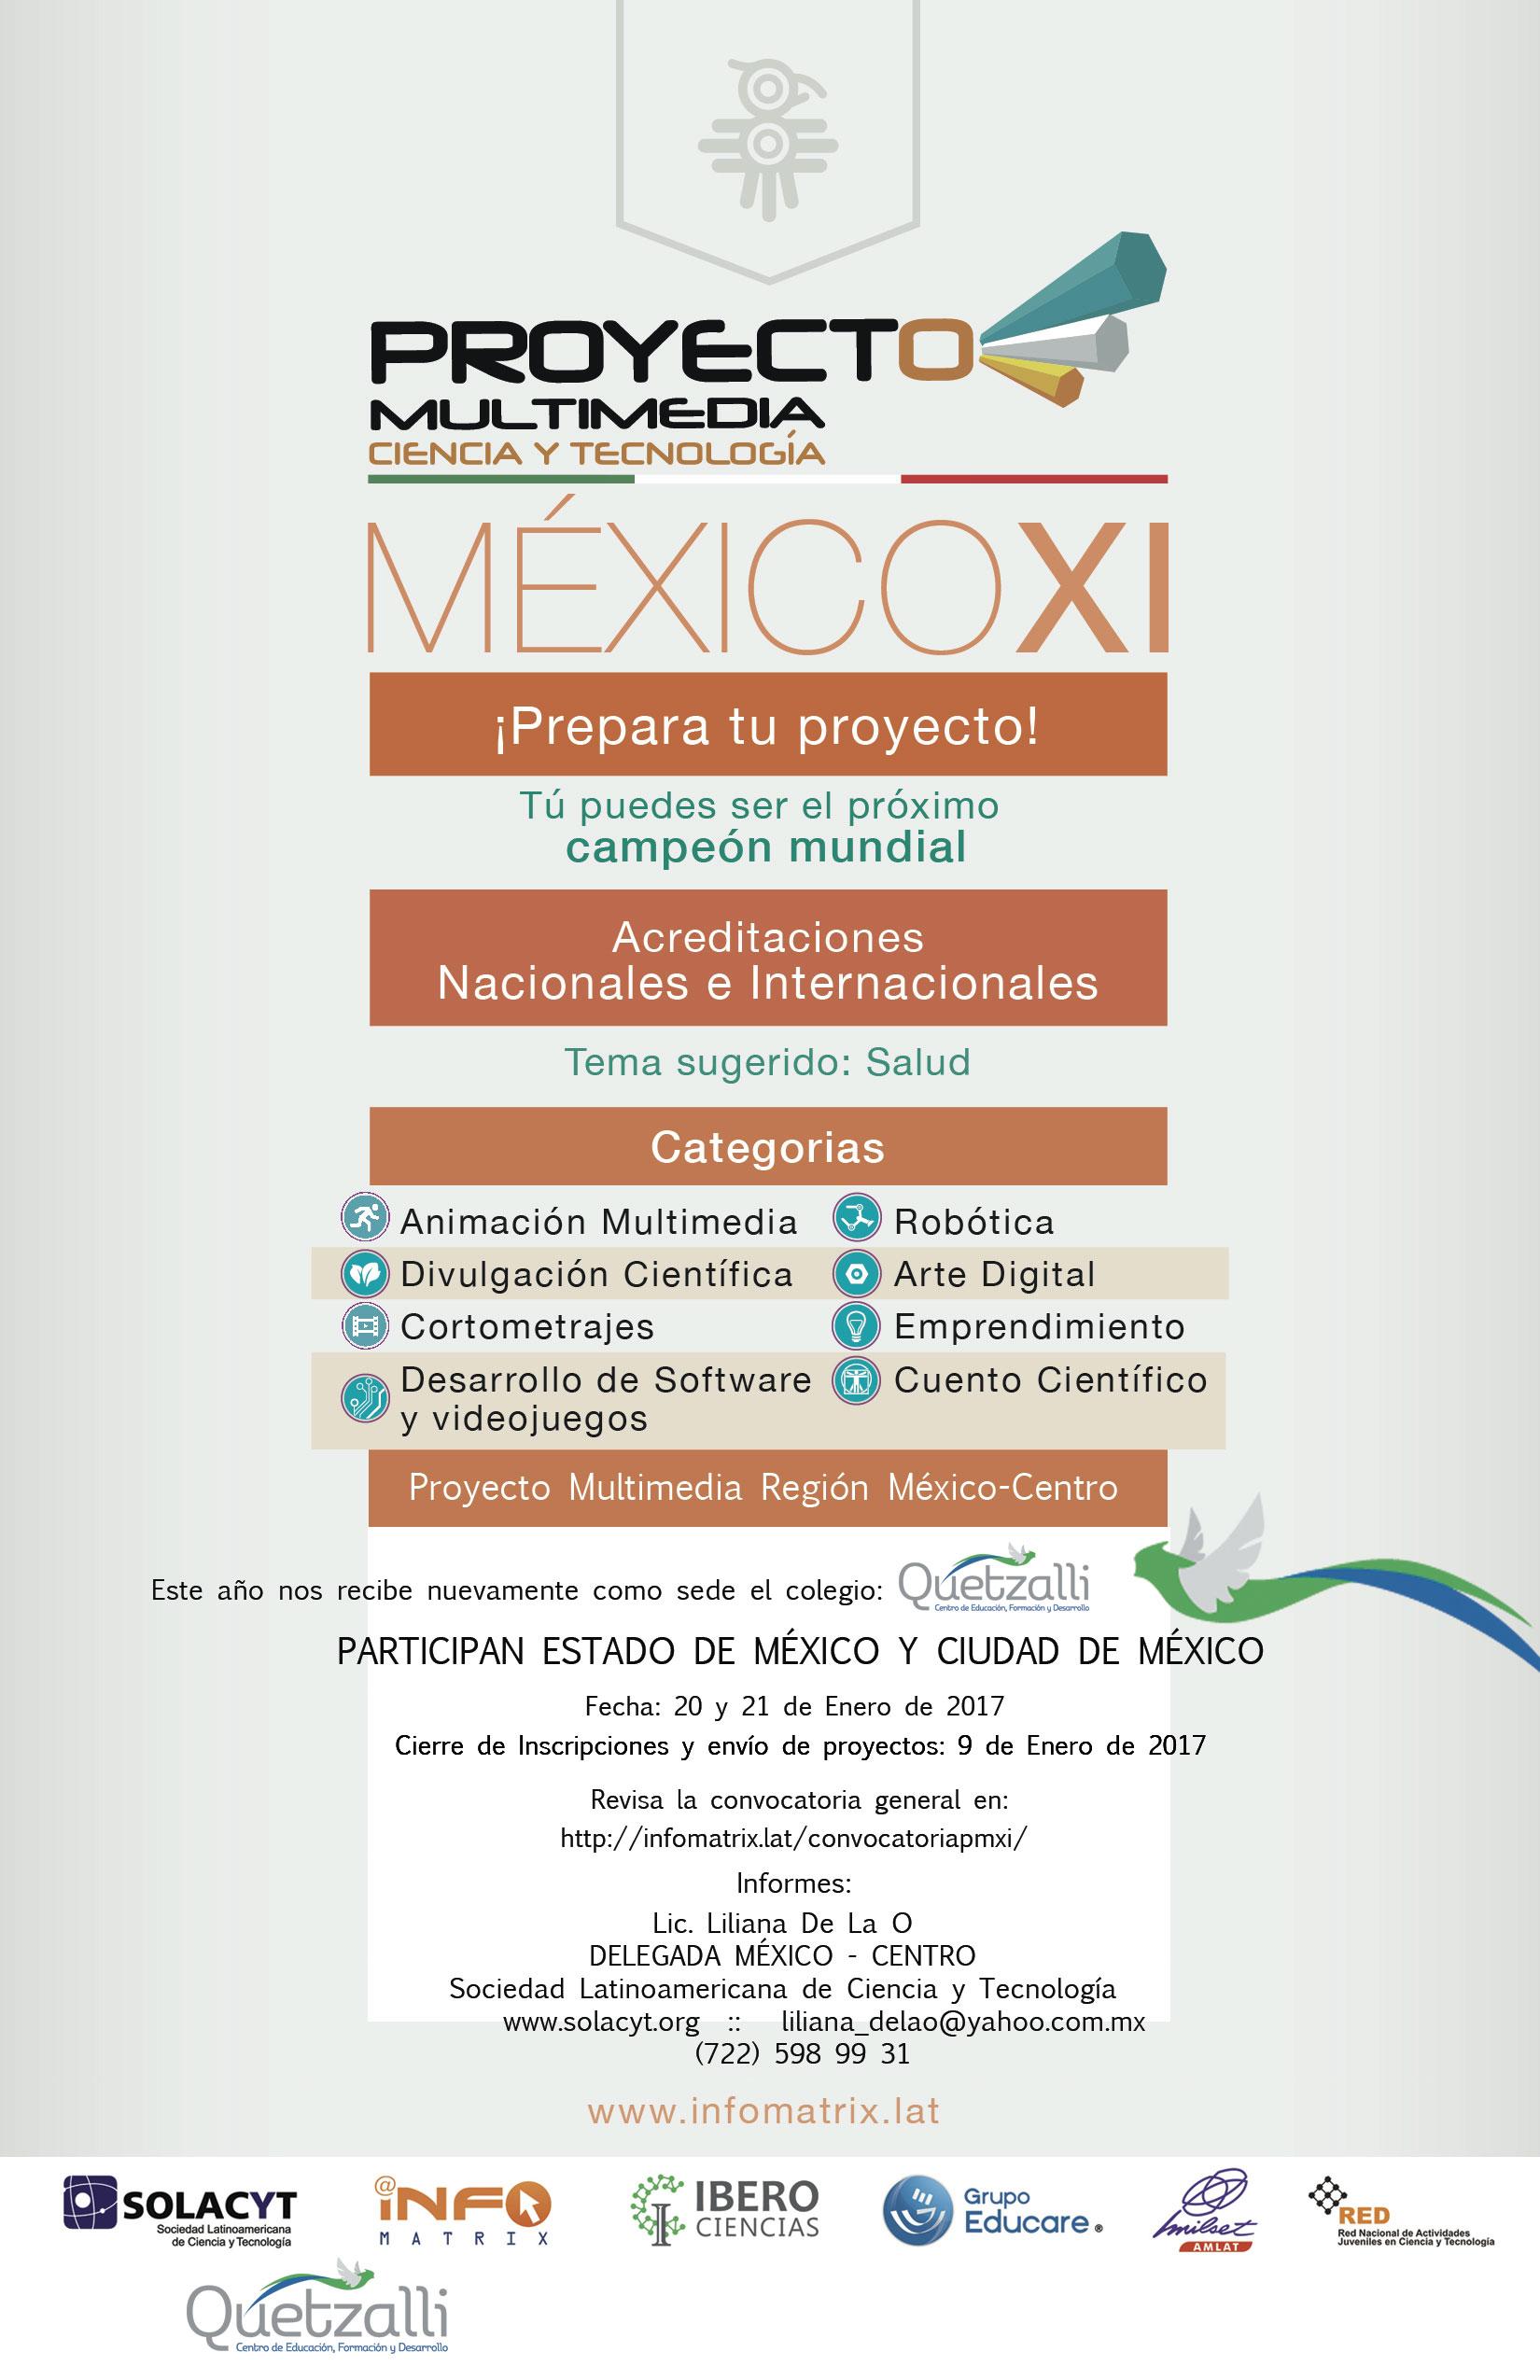 pmxi_mexico_quetzalli